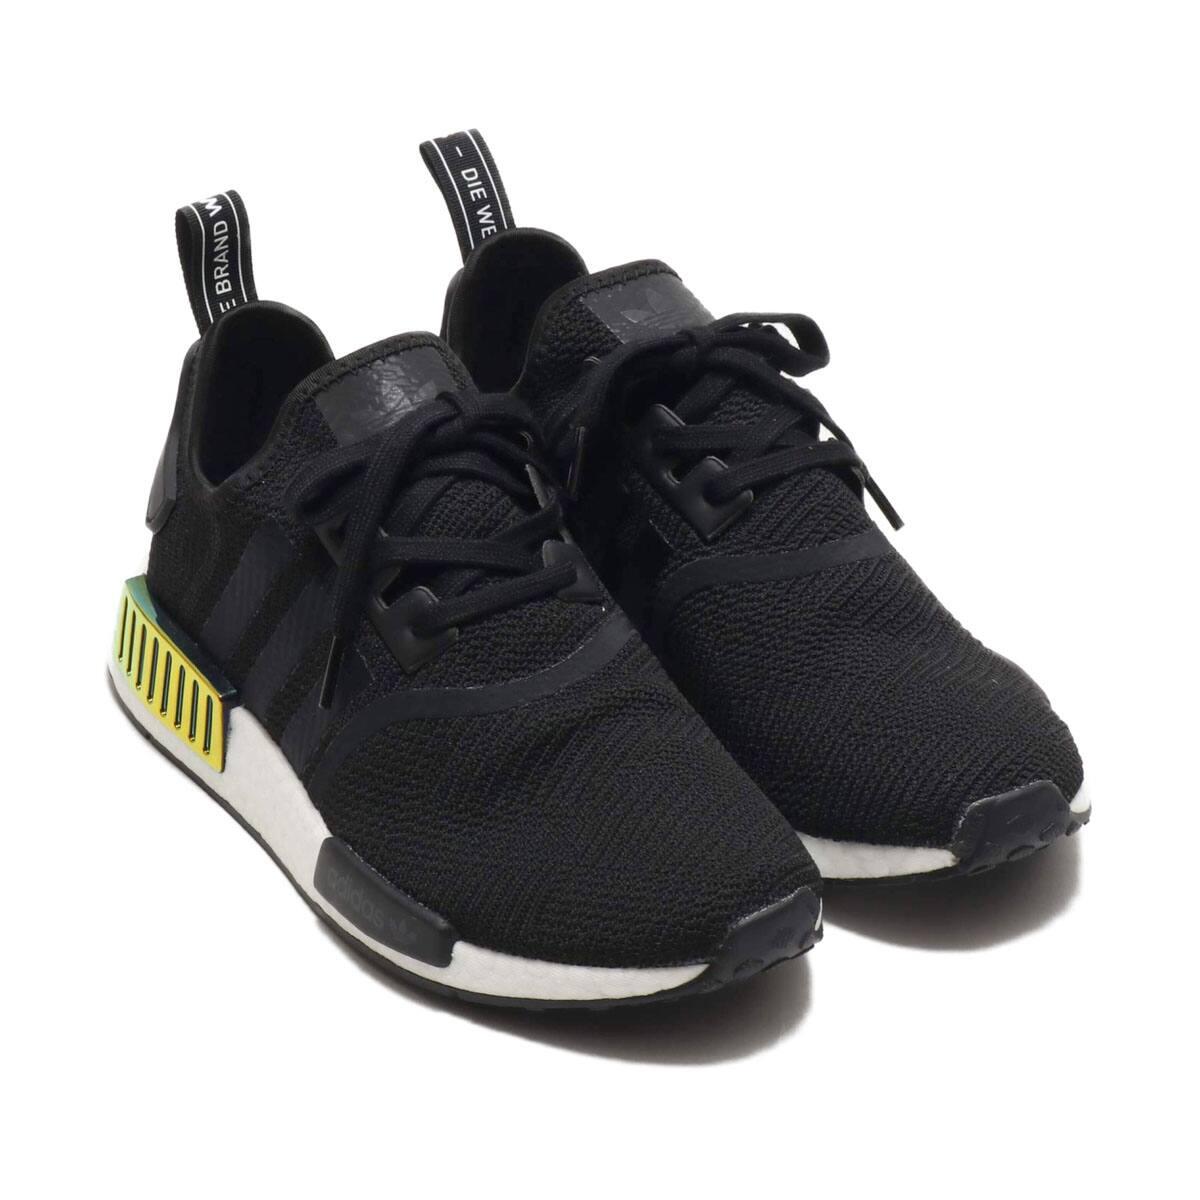 adidas Originals NMD_R1 W CORE BLACK/CORE BLACK/ORCHILD TINT 19FW-I_photo_large